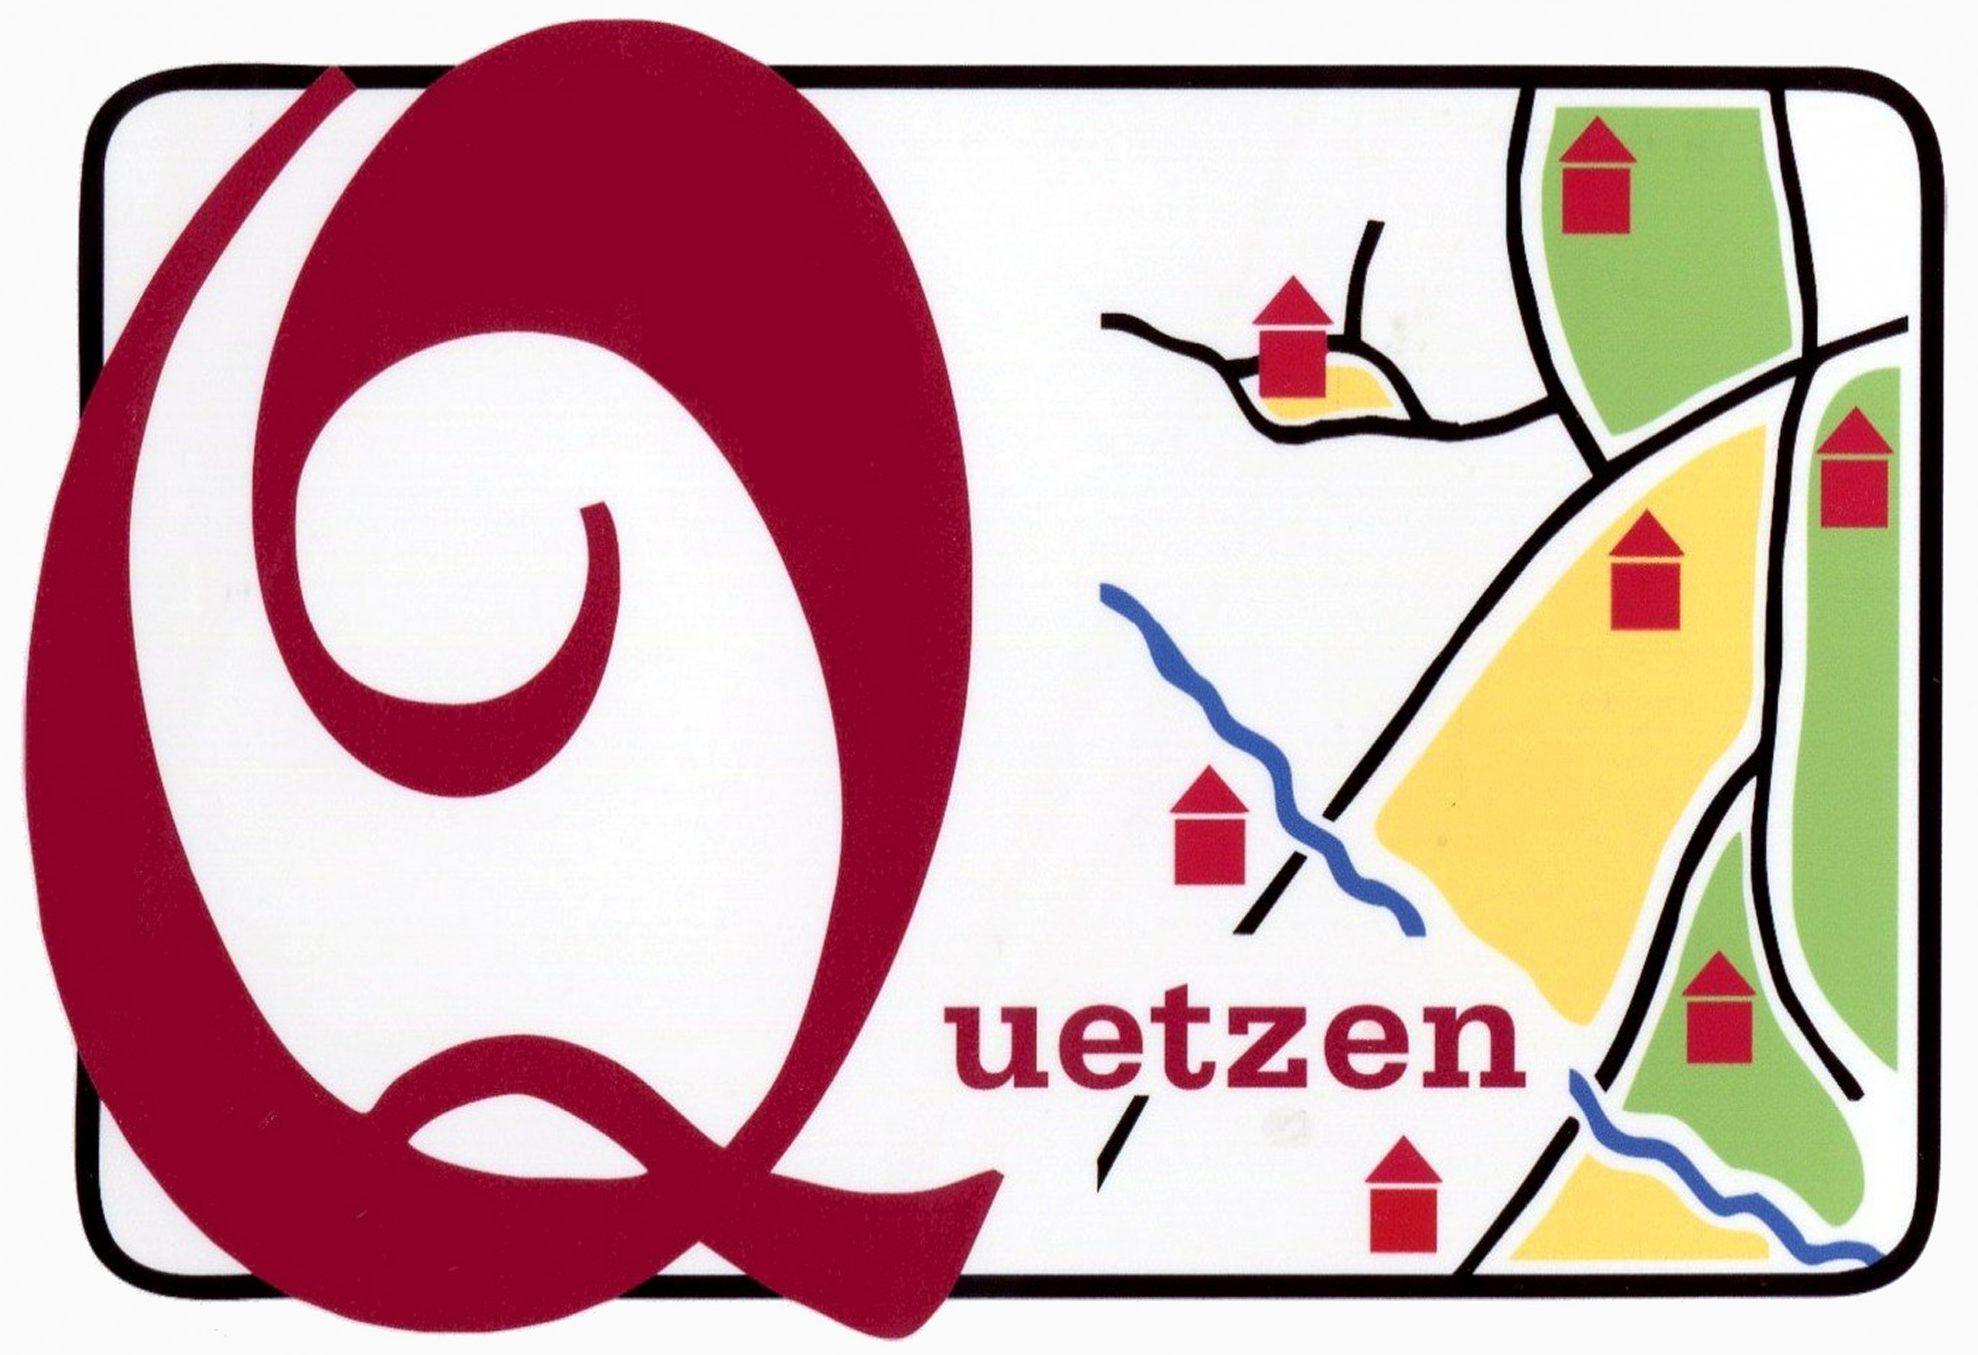 Quetzen.info